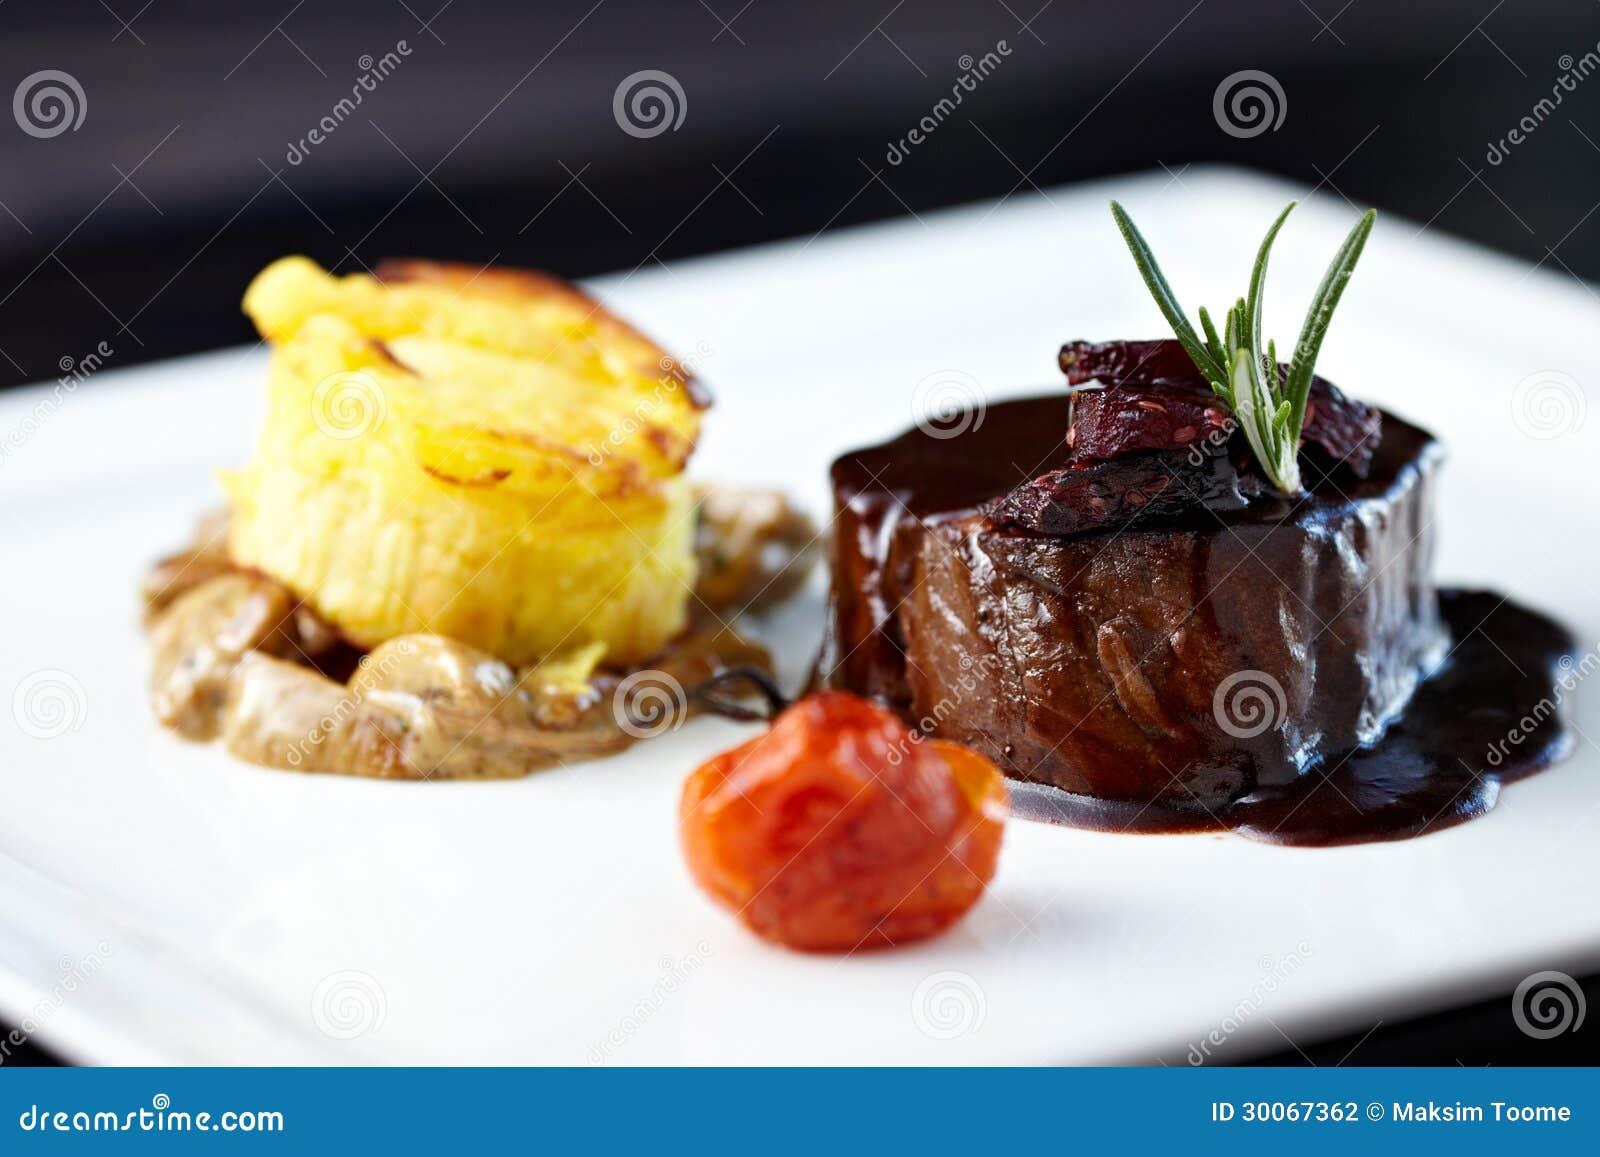 Roasted beef tenderloin with herb-potato muffin, mushroom ragout ...